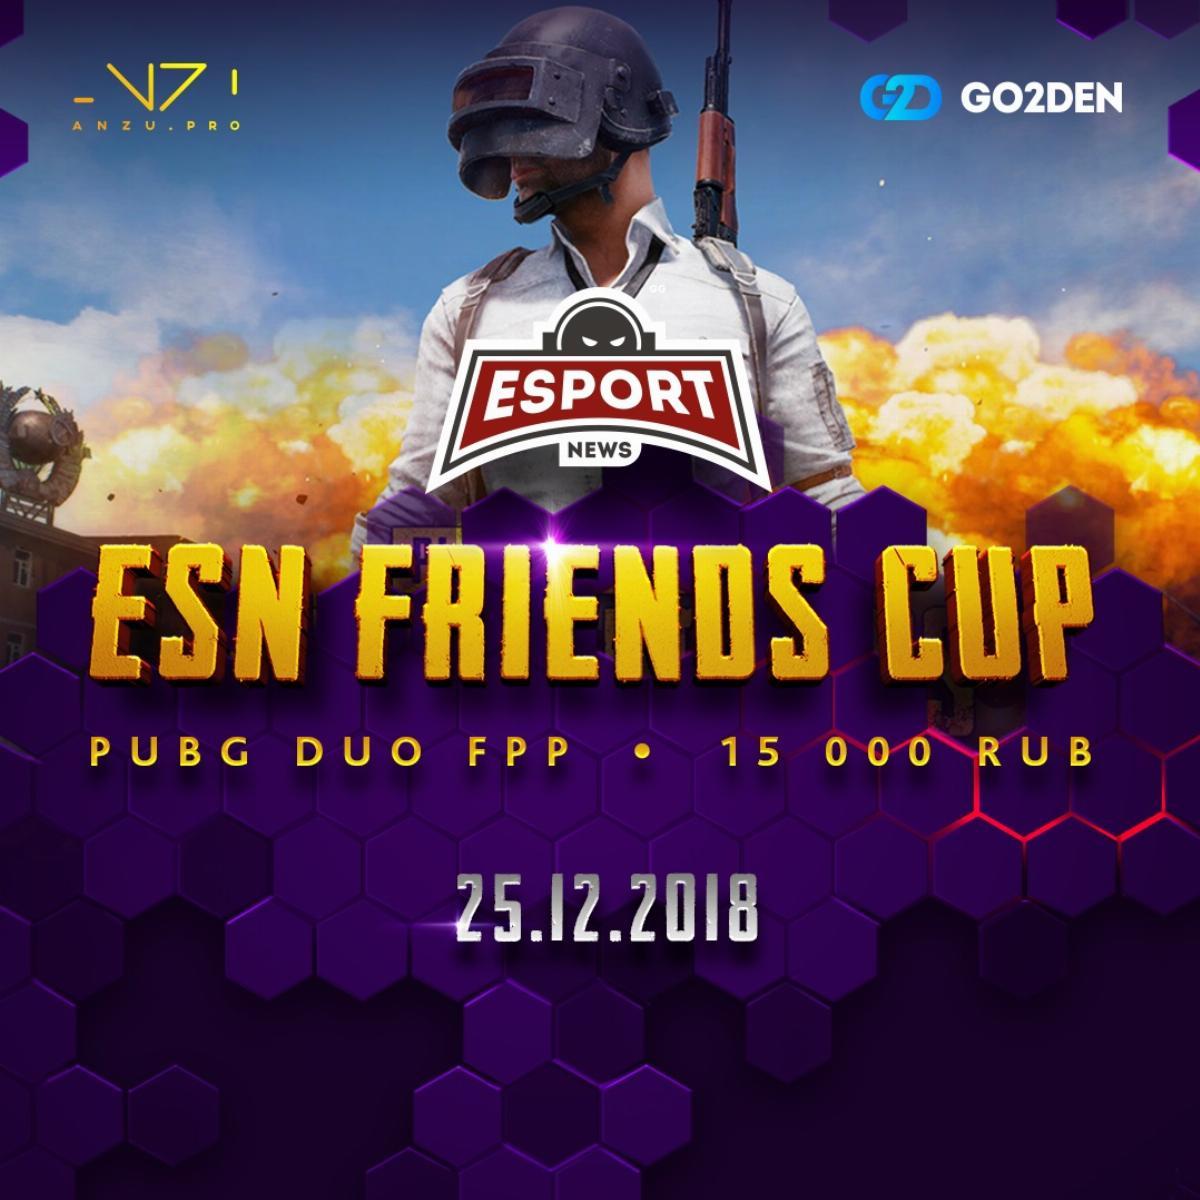 турнир по PUBG, ESN Friends Cup, турнир от esportnews, PUBG